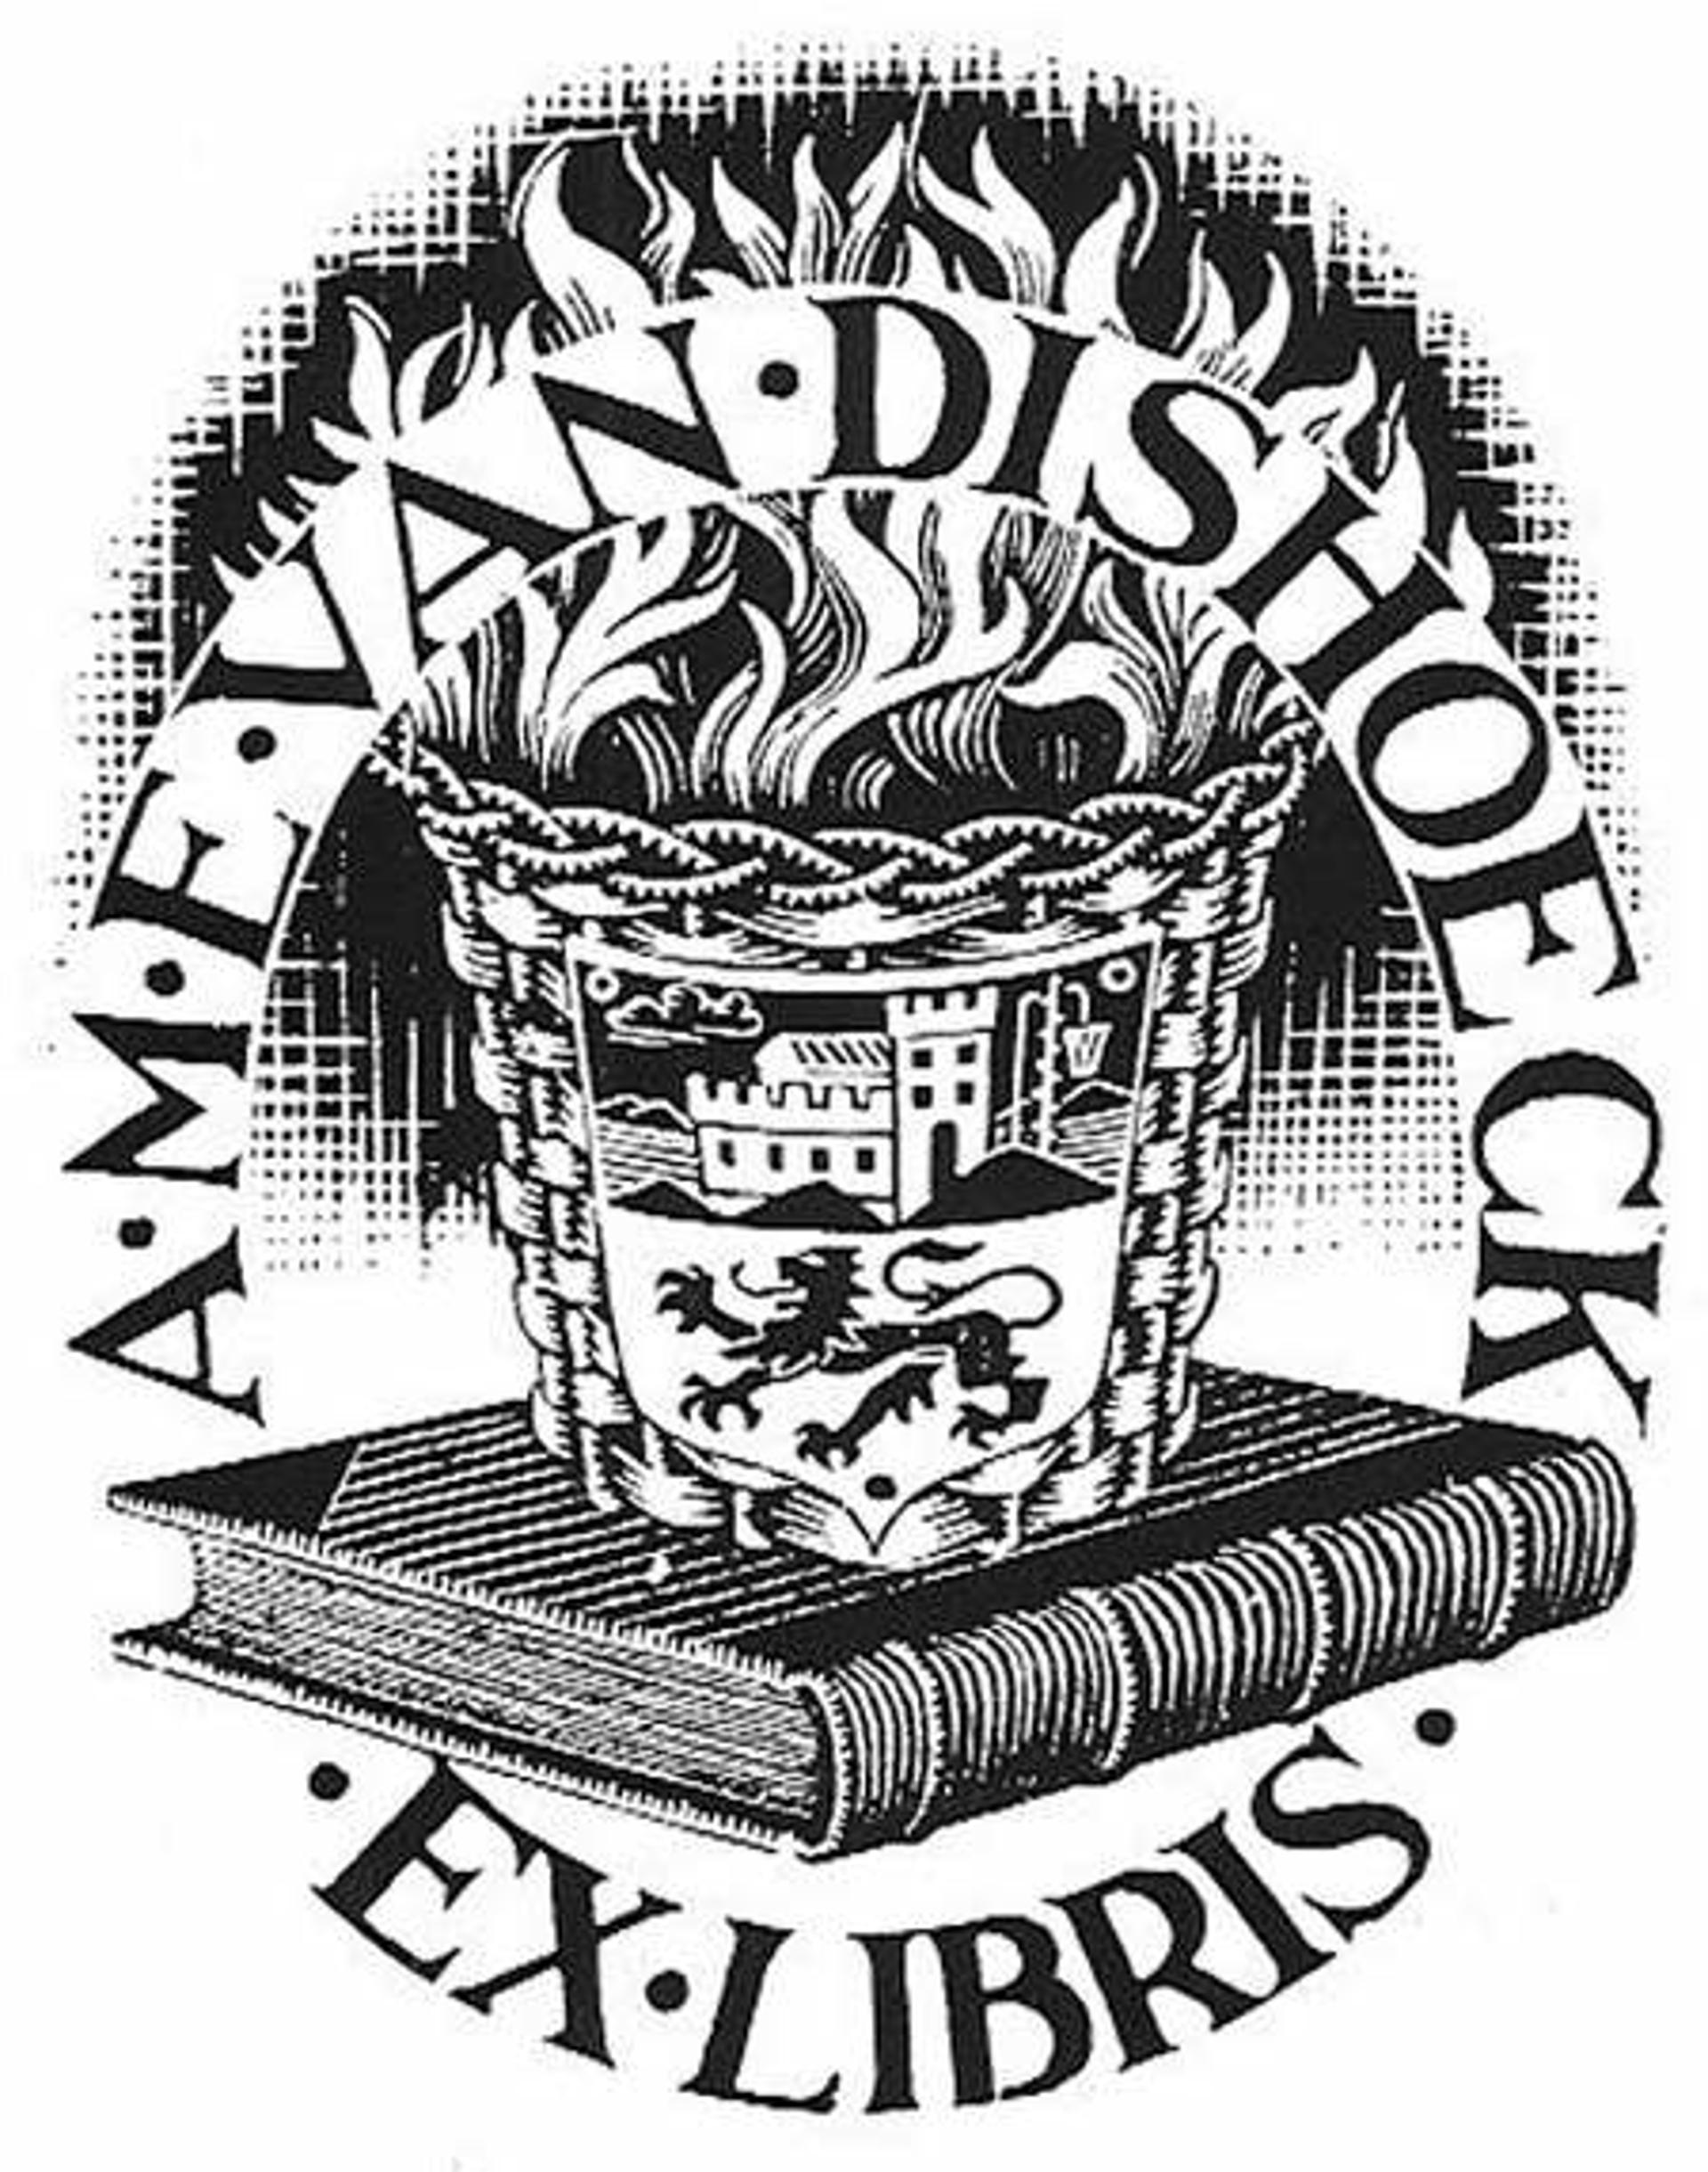 Mystorial - Dj Bobo - CD kaufen | Ex Libris